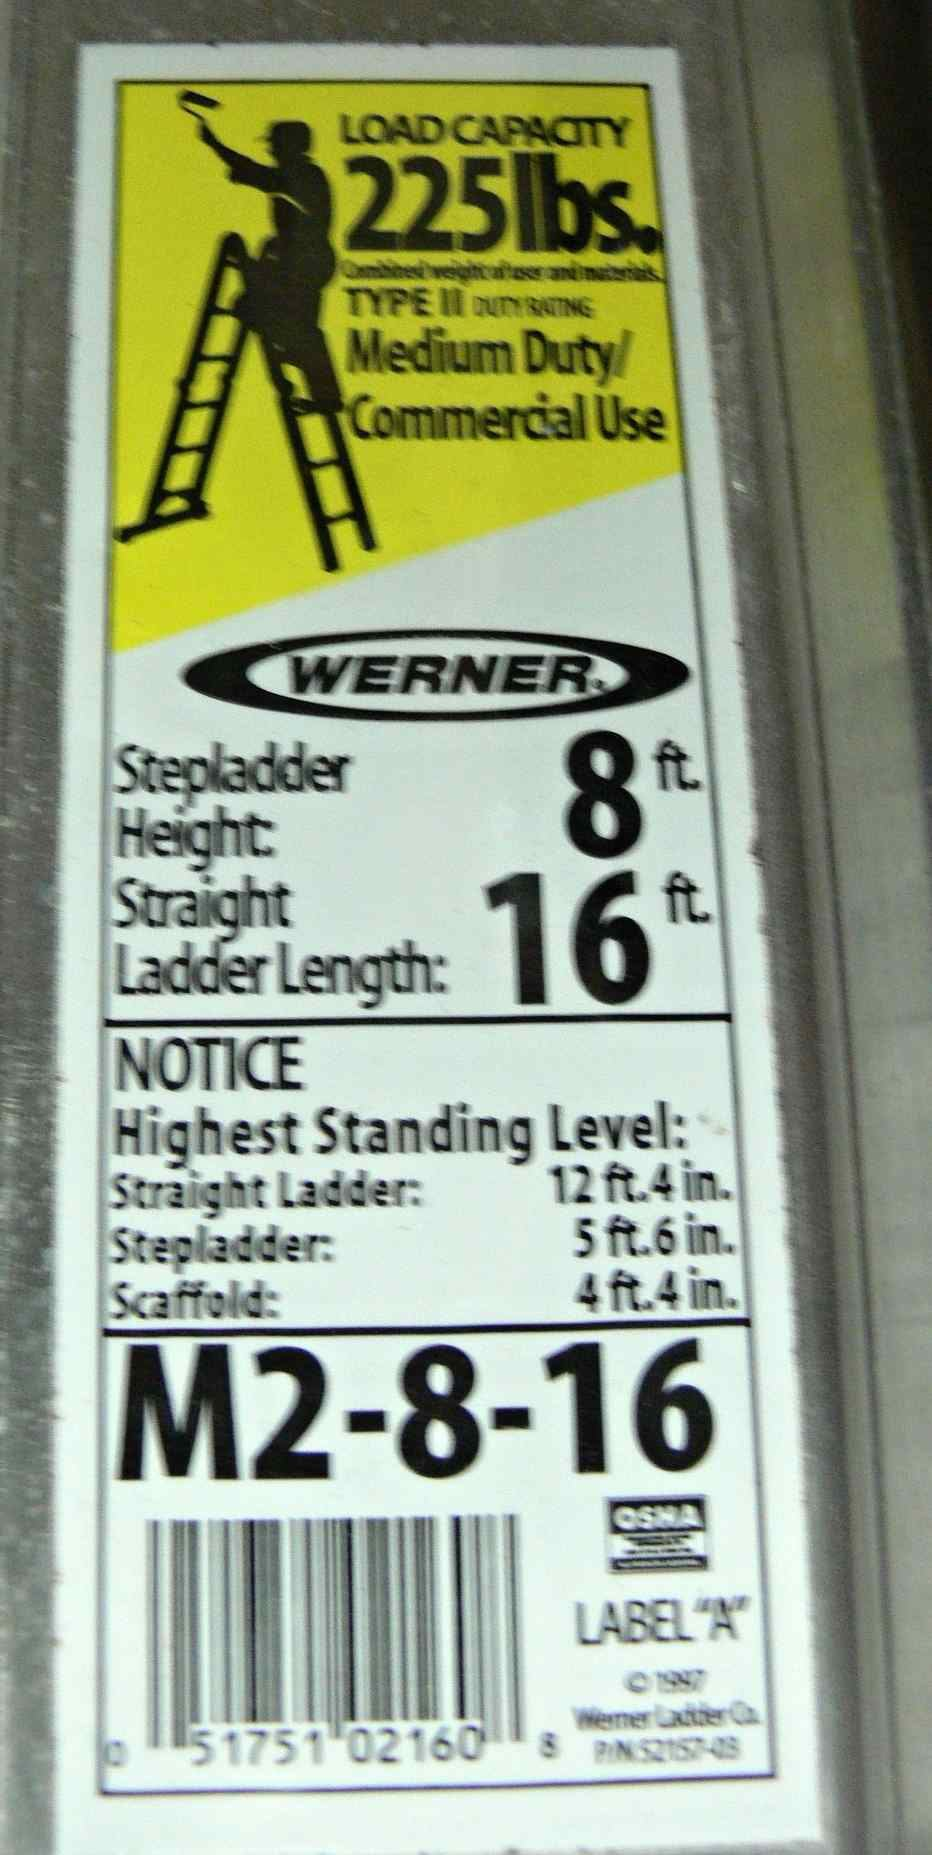 Cash Usa Pawnshop Werner Ladder M2 8 16